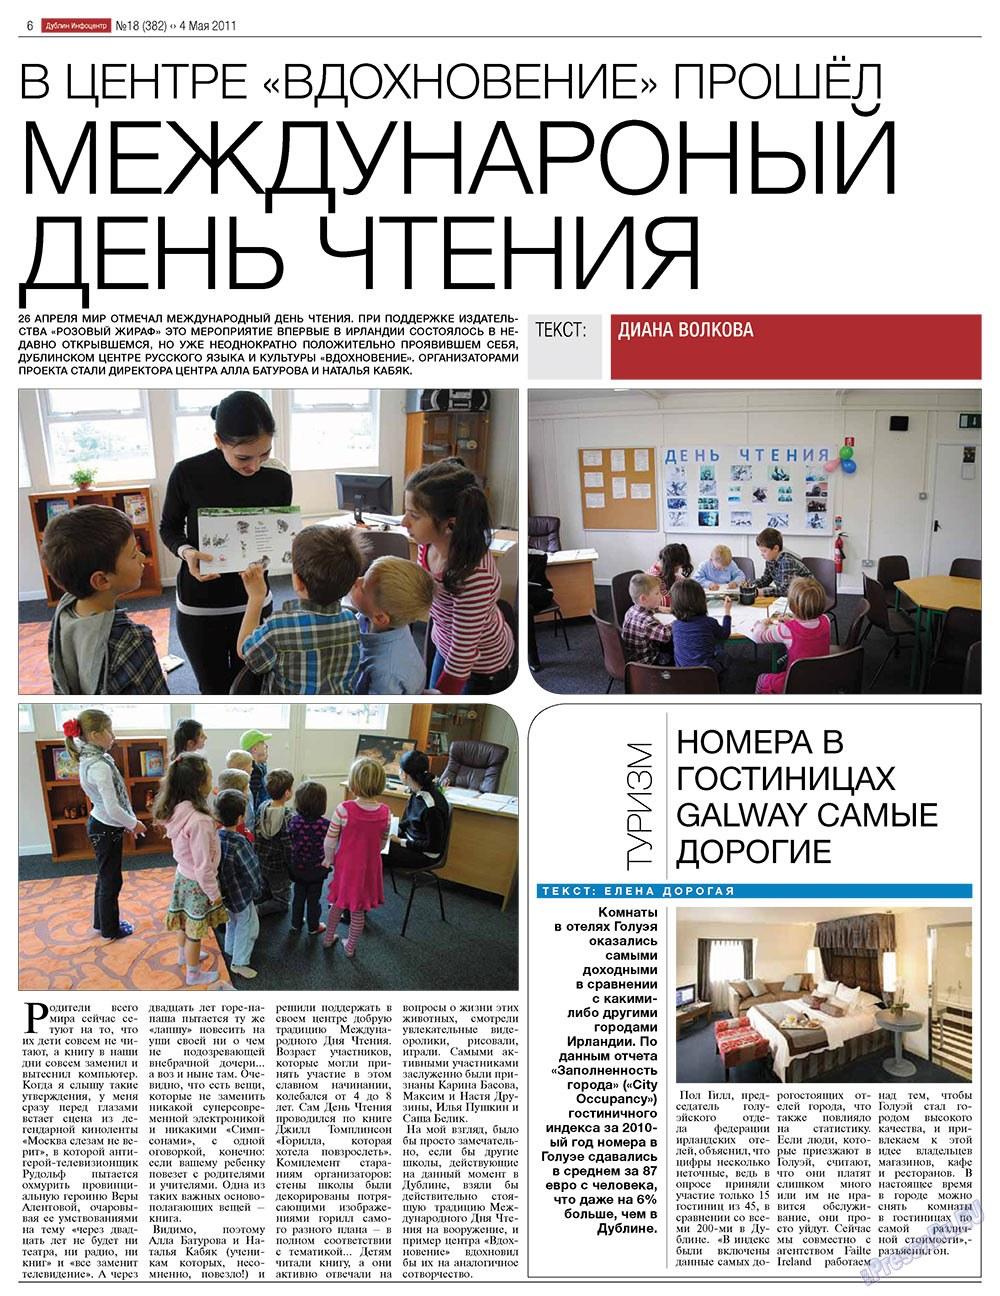 Дублин инфоцентр (газета). 2011 год, номер 18, стр. 6